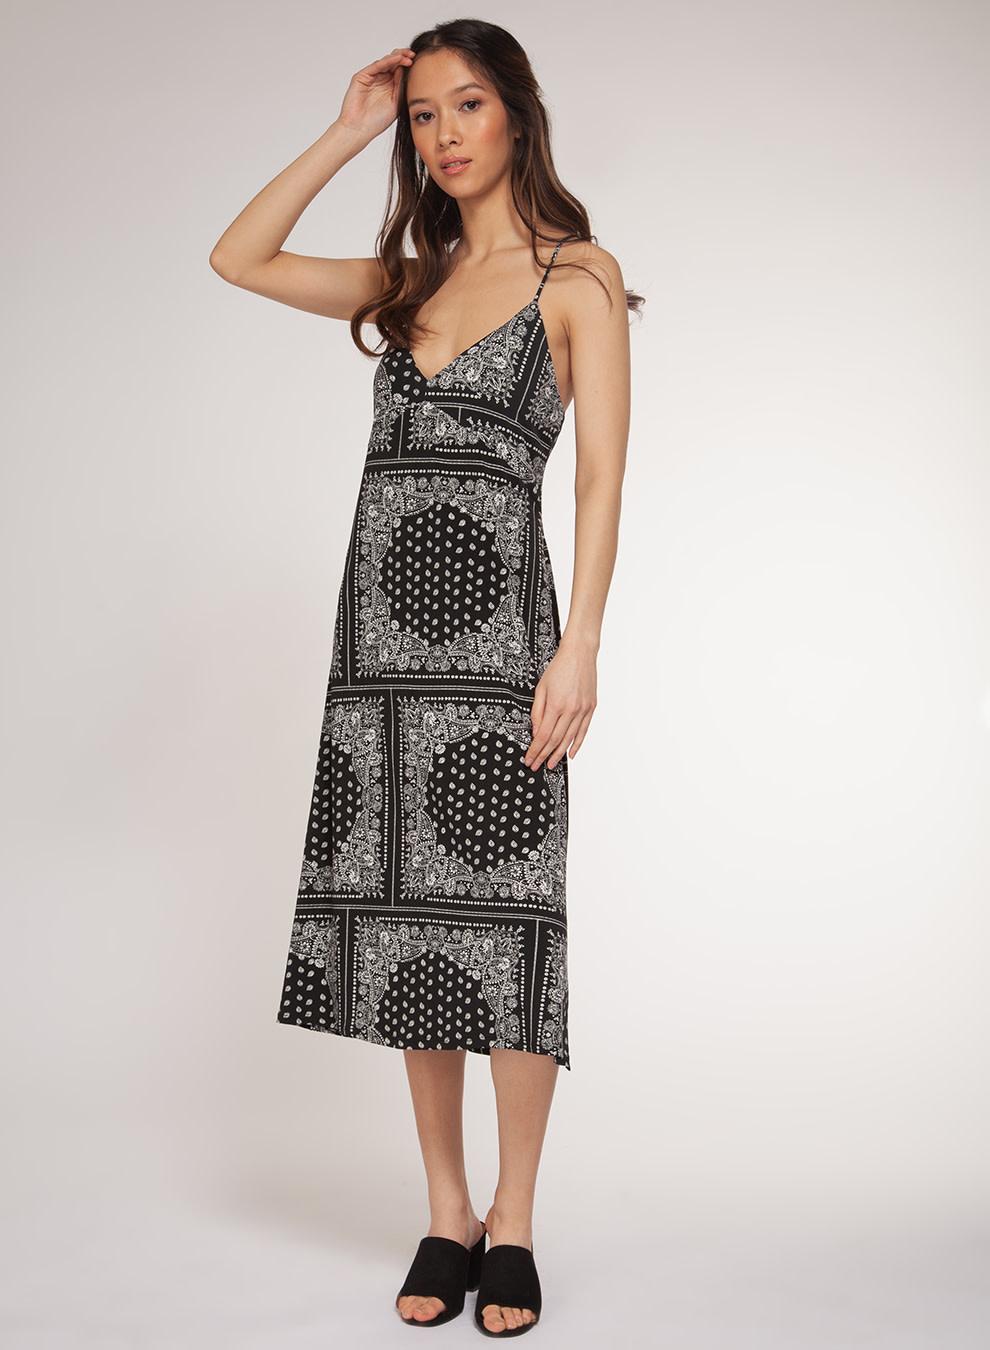 DEX SPAGHETTI STRAP KNEE LENGHT DRESS